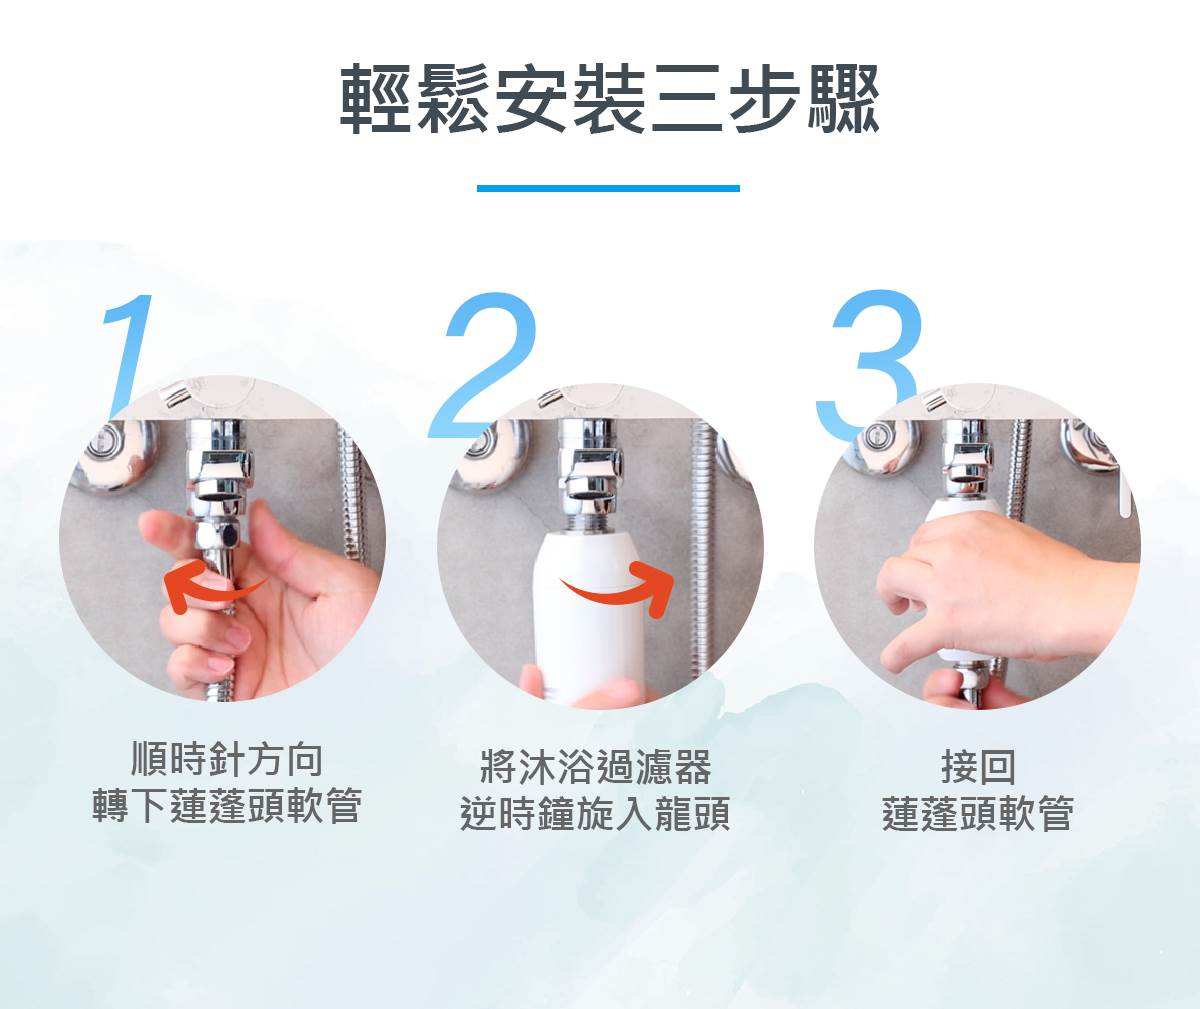 Vitaway-森林SPA沐浴過濾器-08-輕鬆安裝3步驟